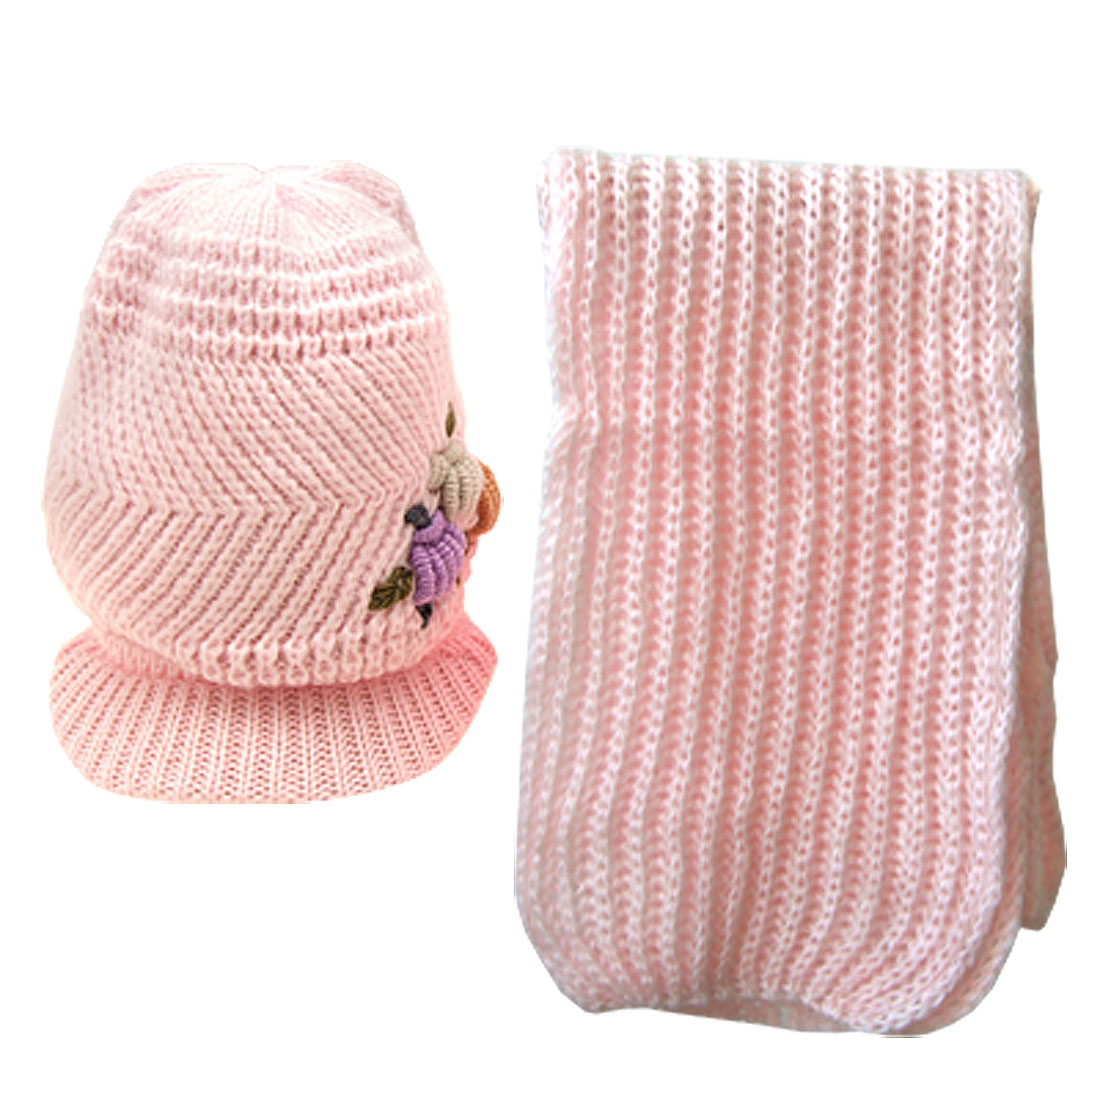 Pink Crochet Girls Ski Visor Beanie Hat Cap and Scarf